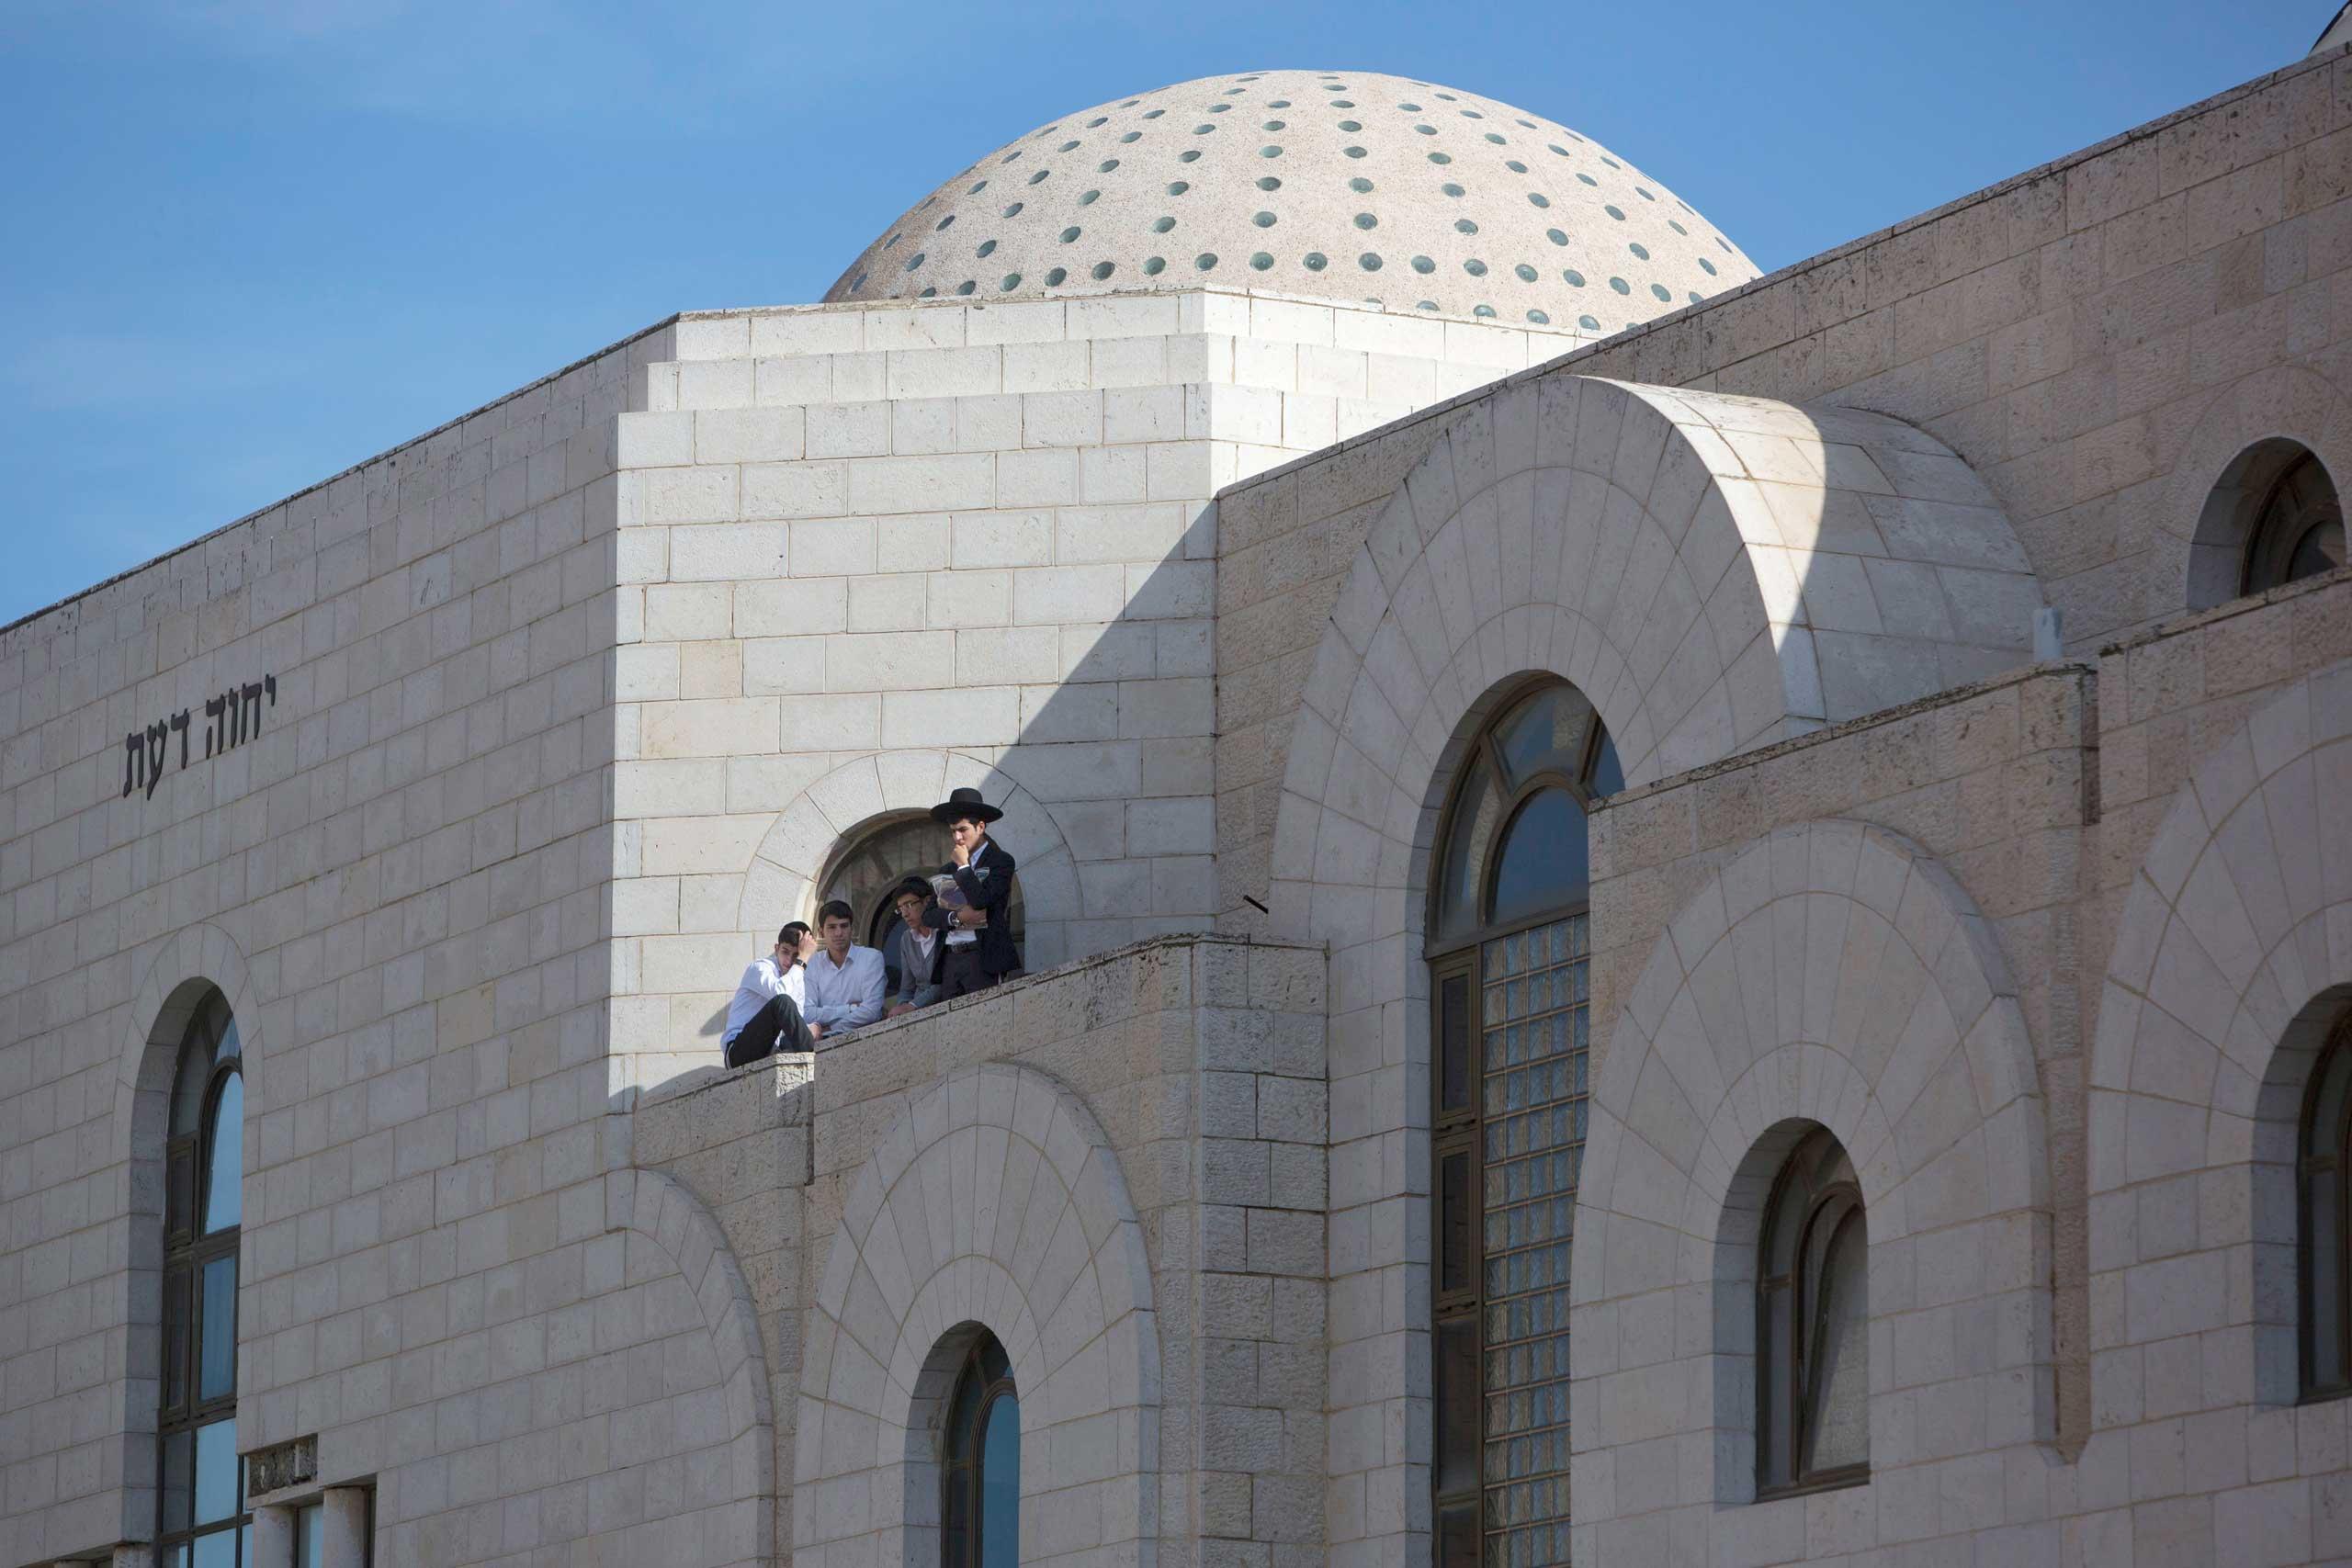 Ultra-Orthodox Jewish boys look at the scene in Jerusalem on Nov. 18, 2014.